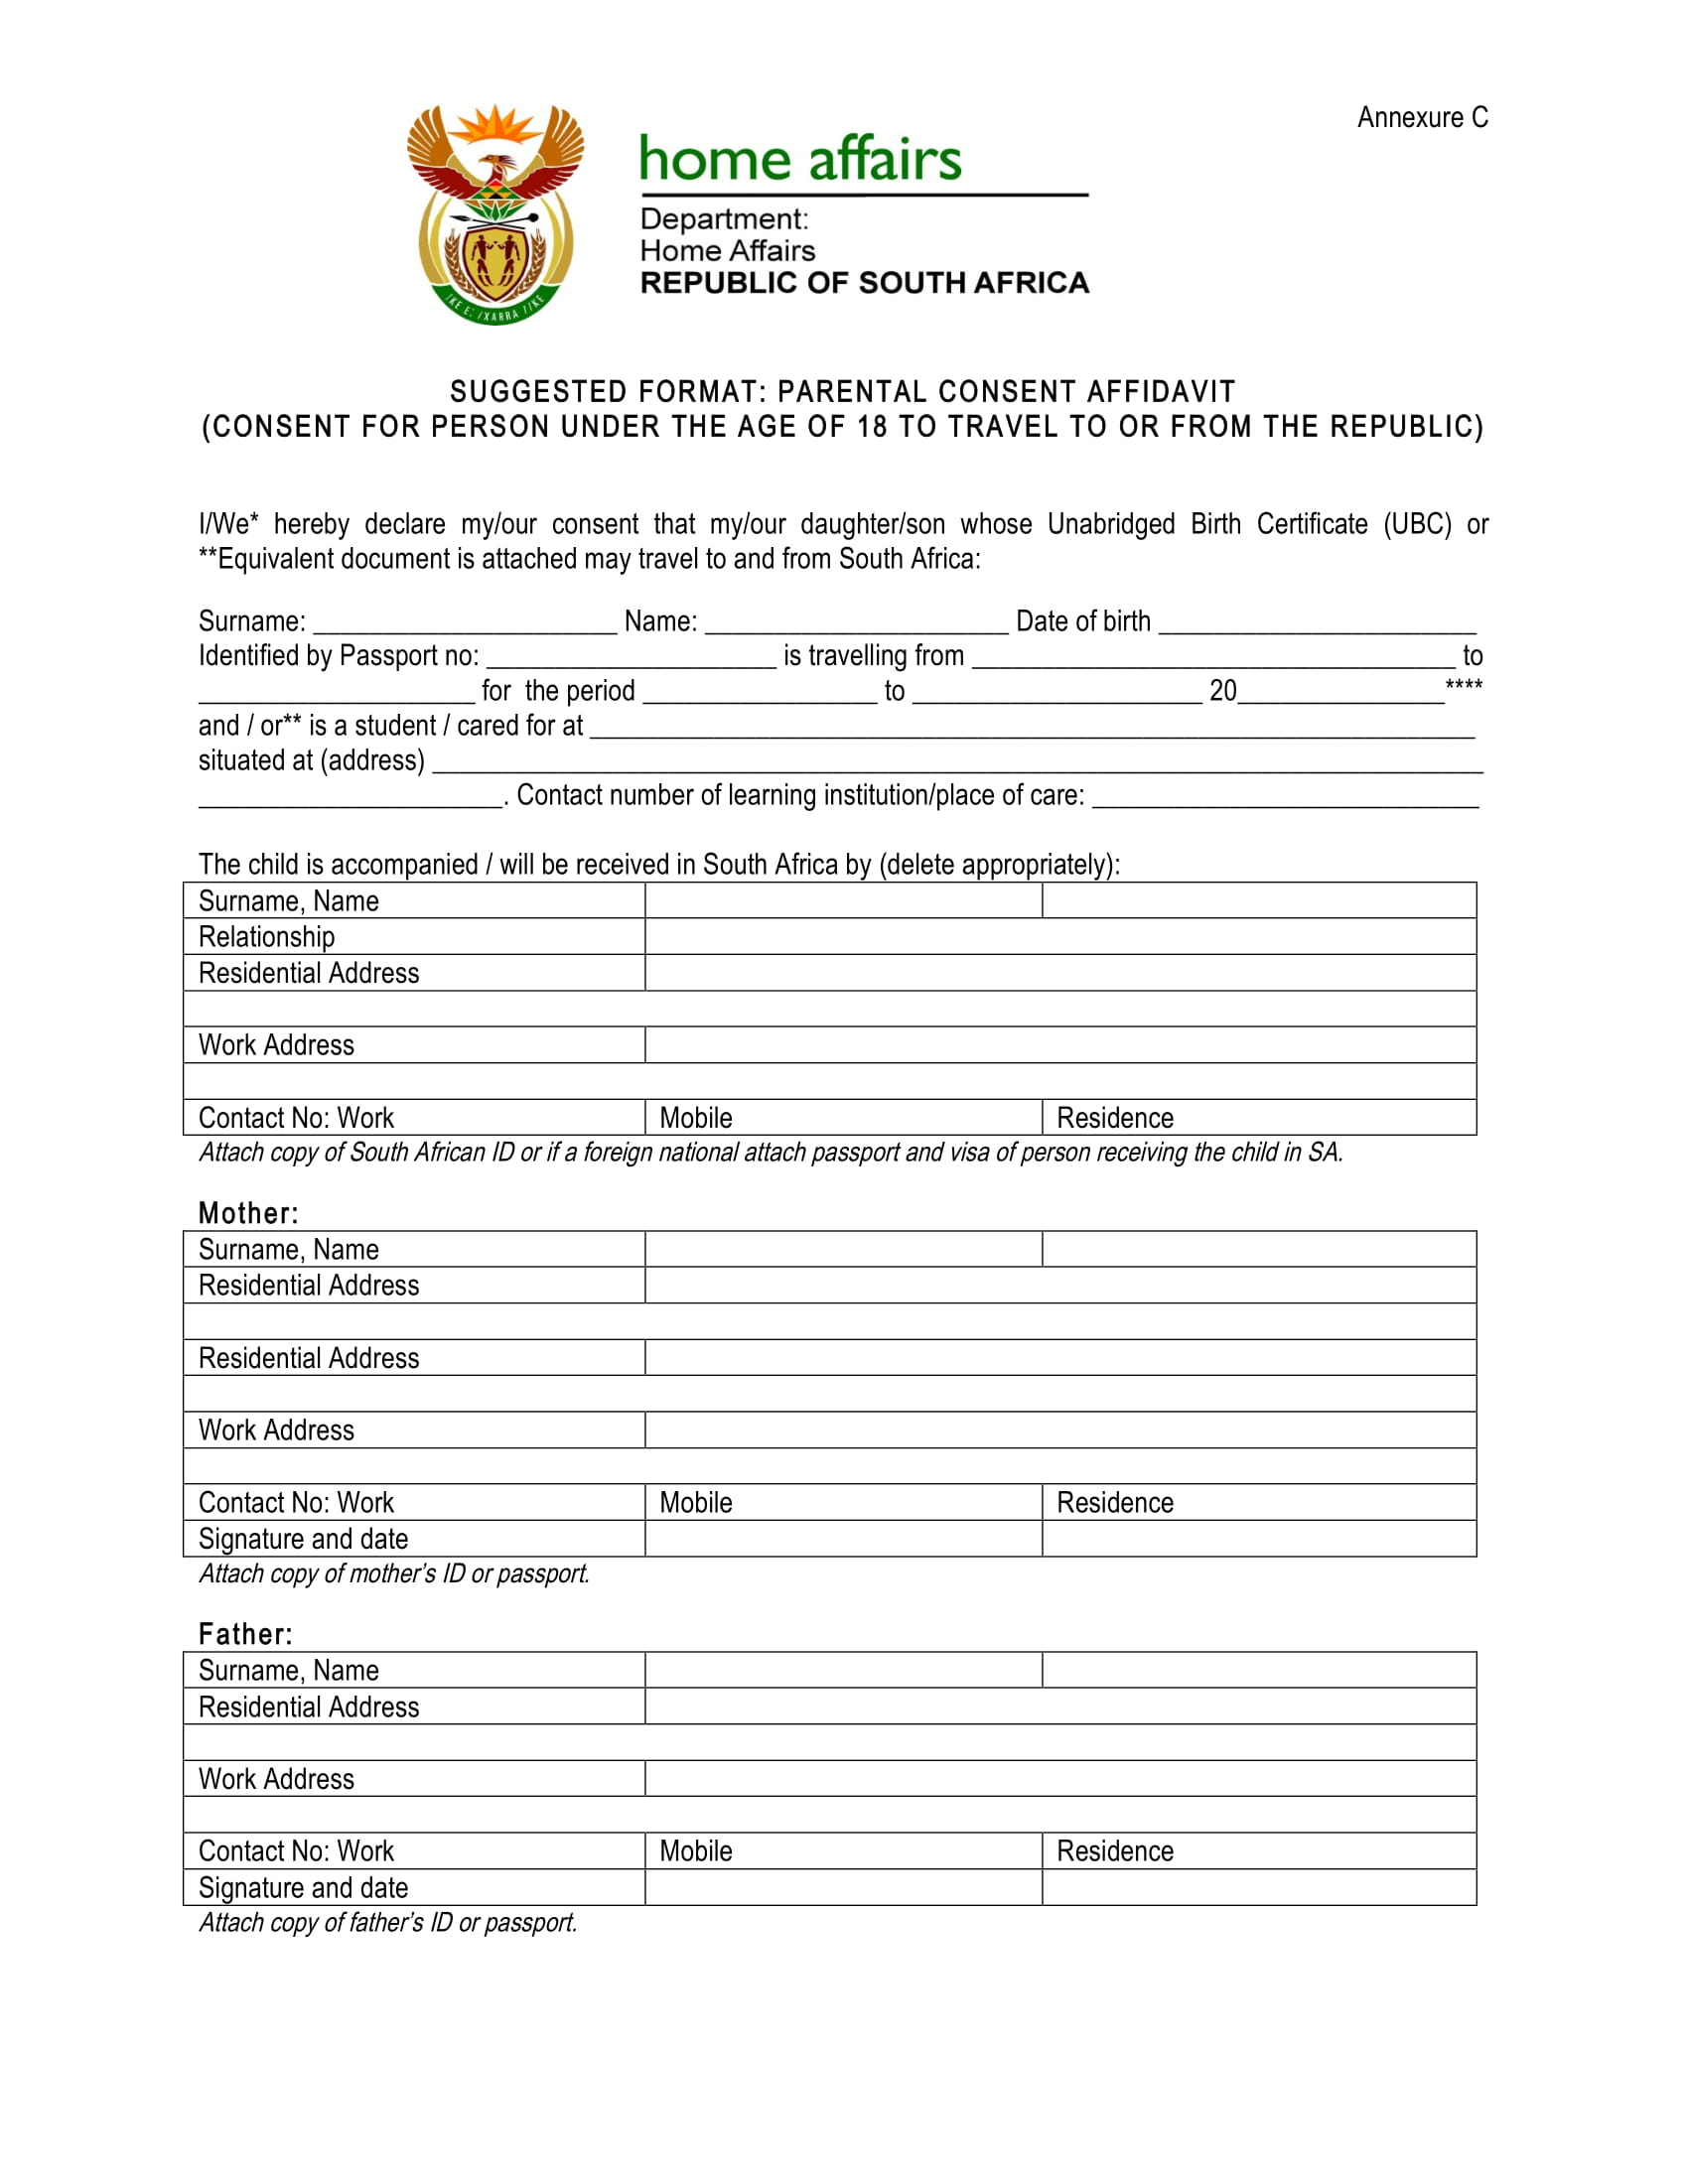 parental consent affidavit